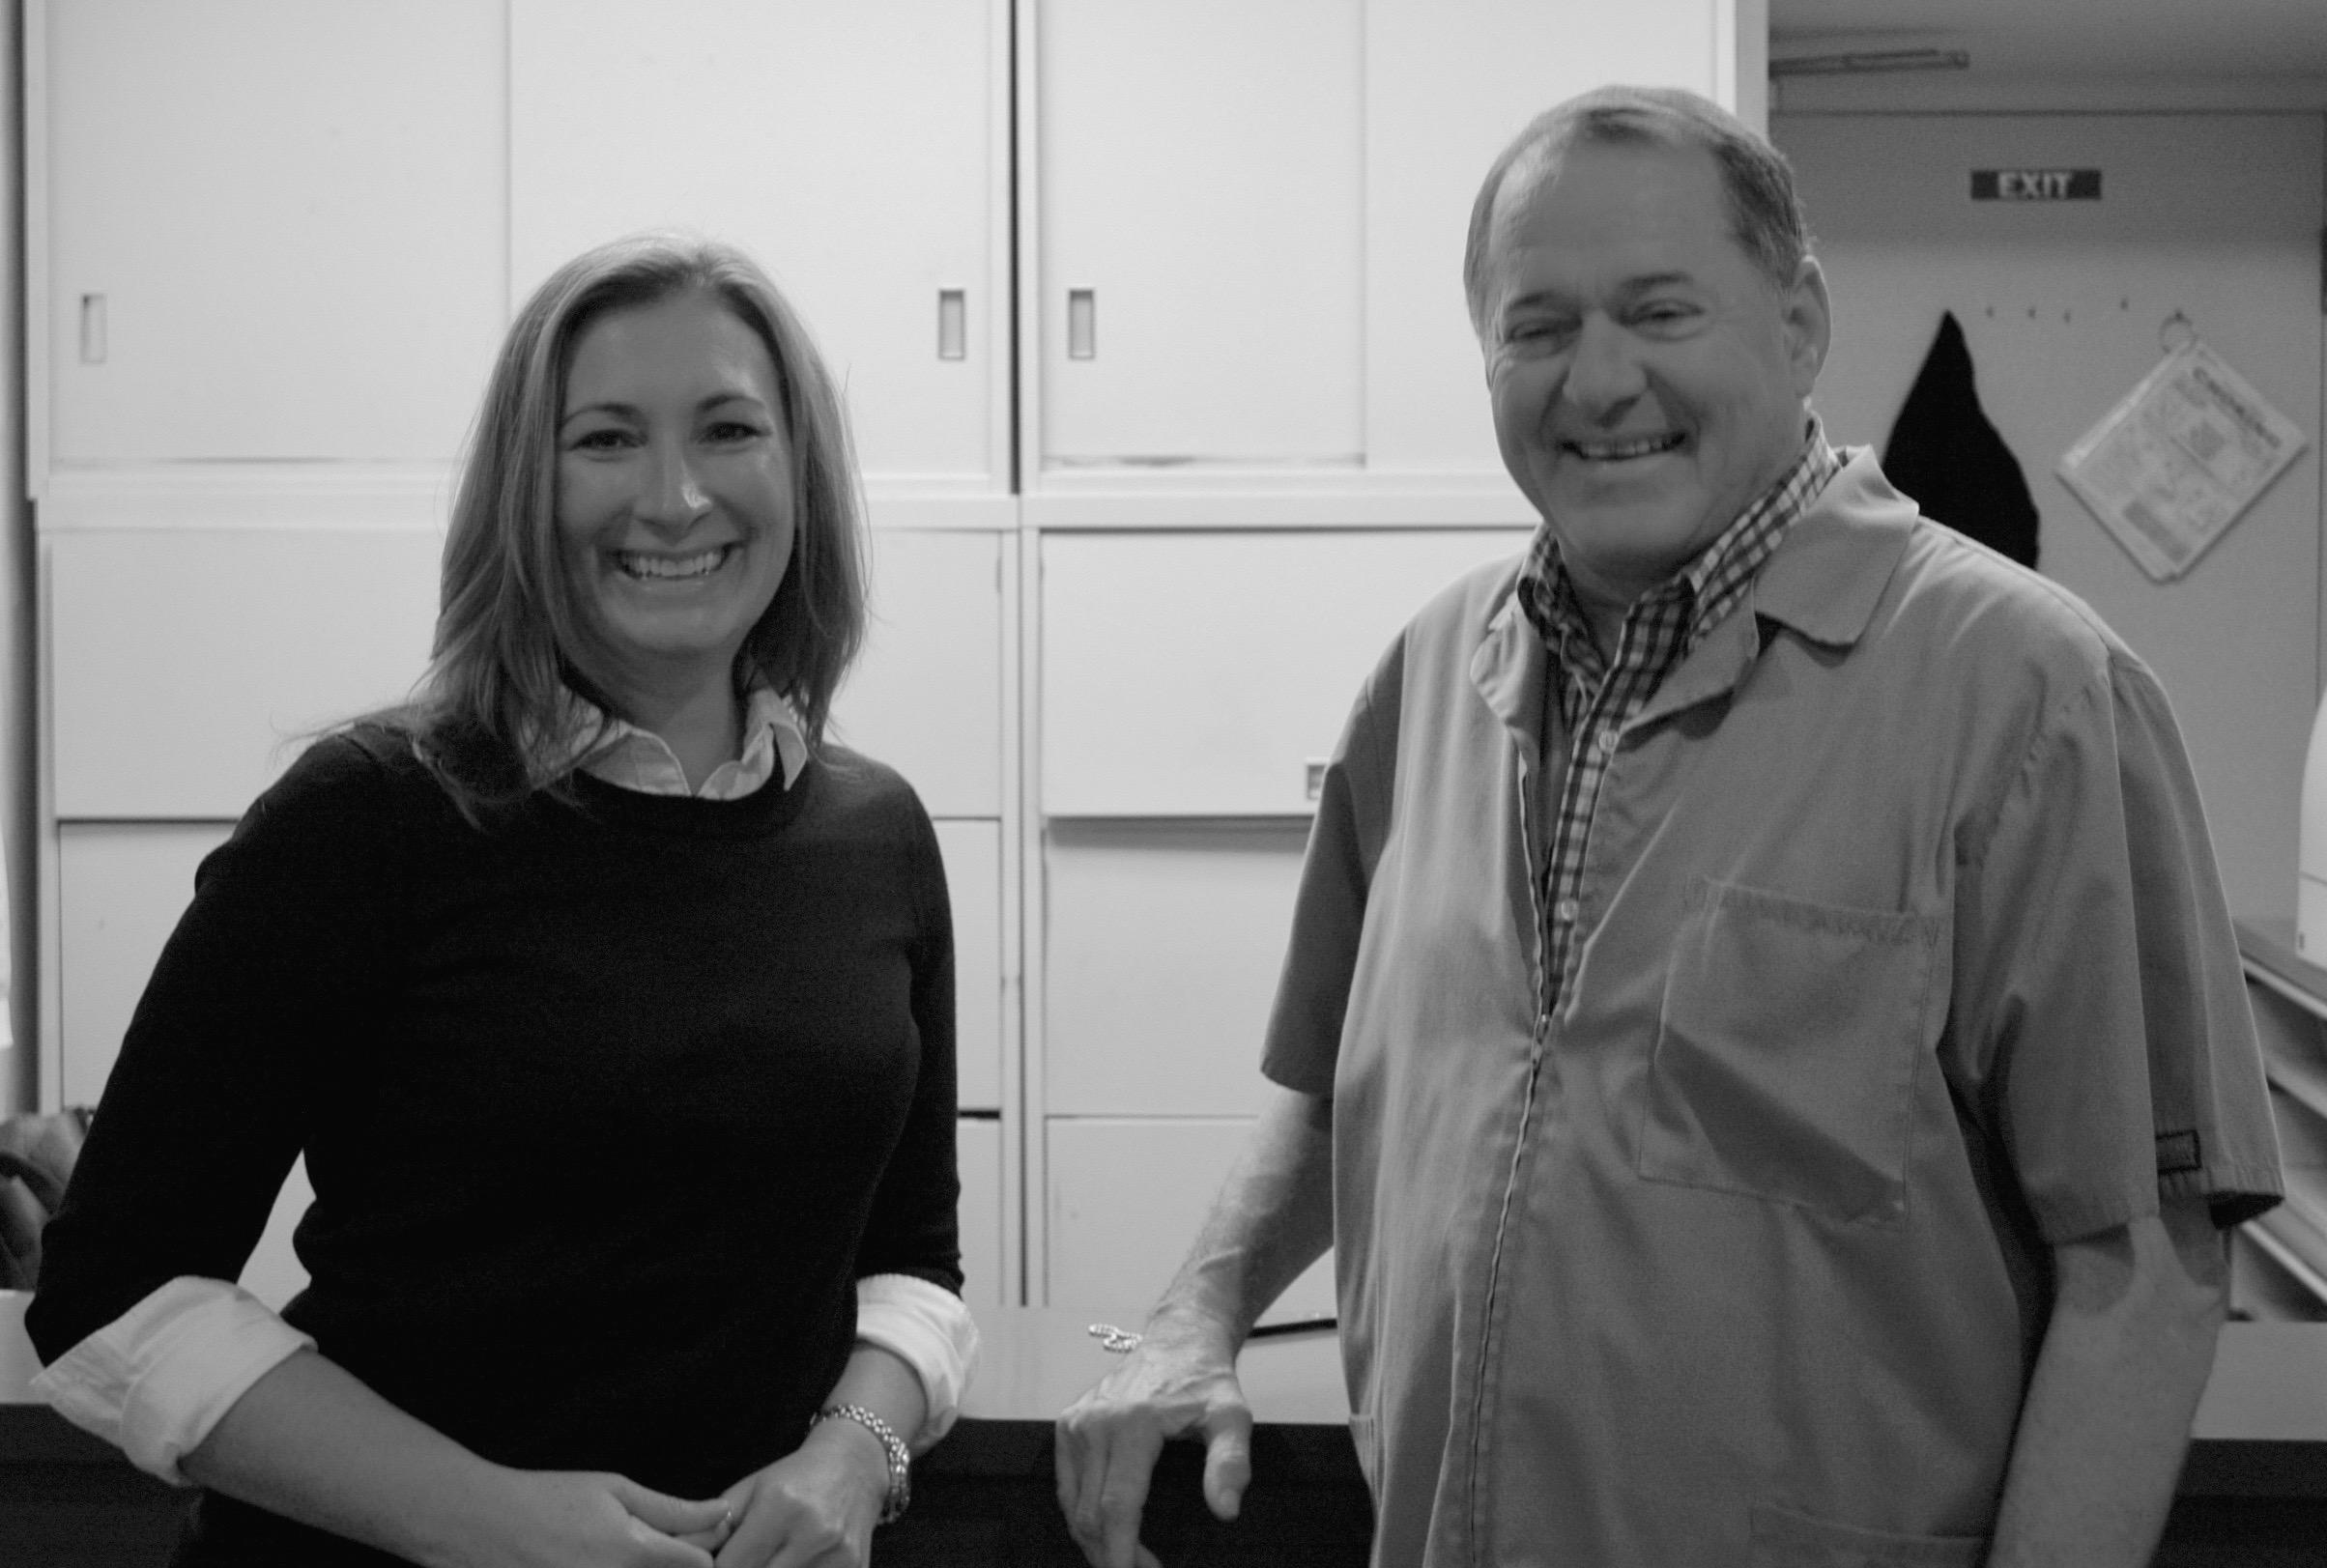 Alexa S. Keegan DDS FICOI with David M. Hannan DDS, retired.